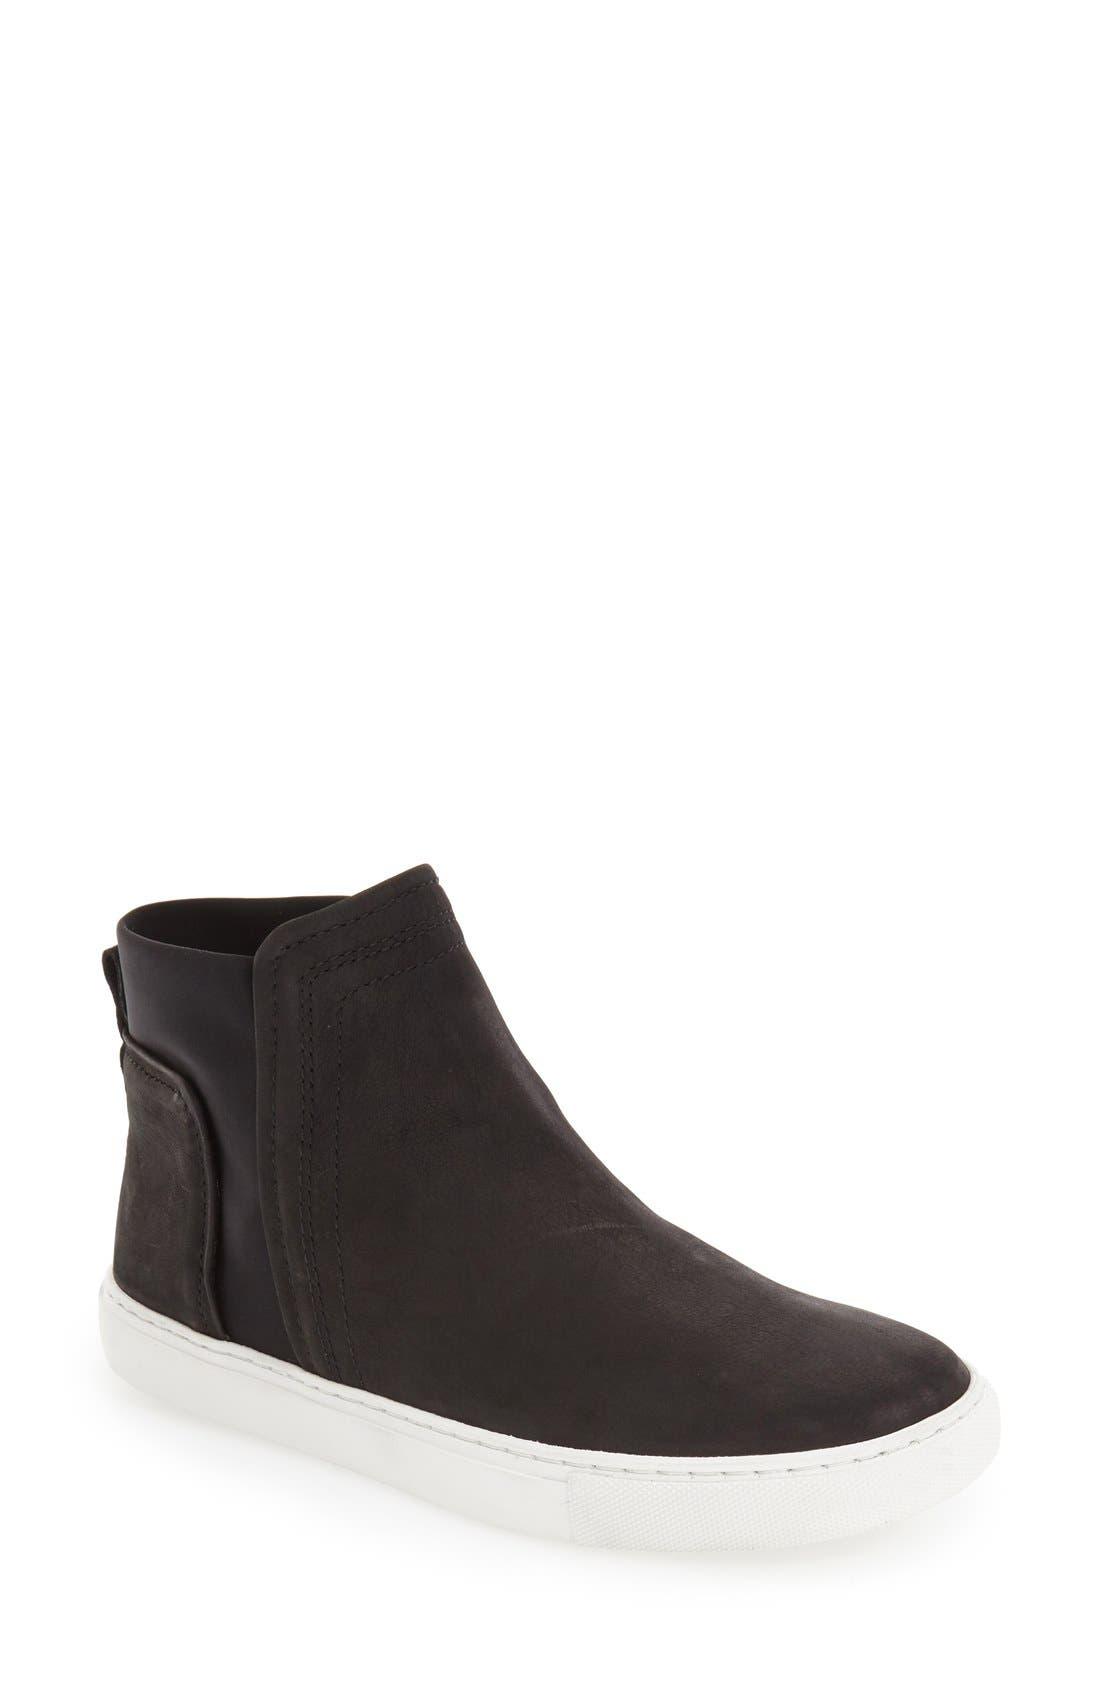 'Ken' Leather Slip-On Sneaker,                             Main thumbnail 1, color,                             001